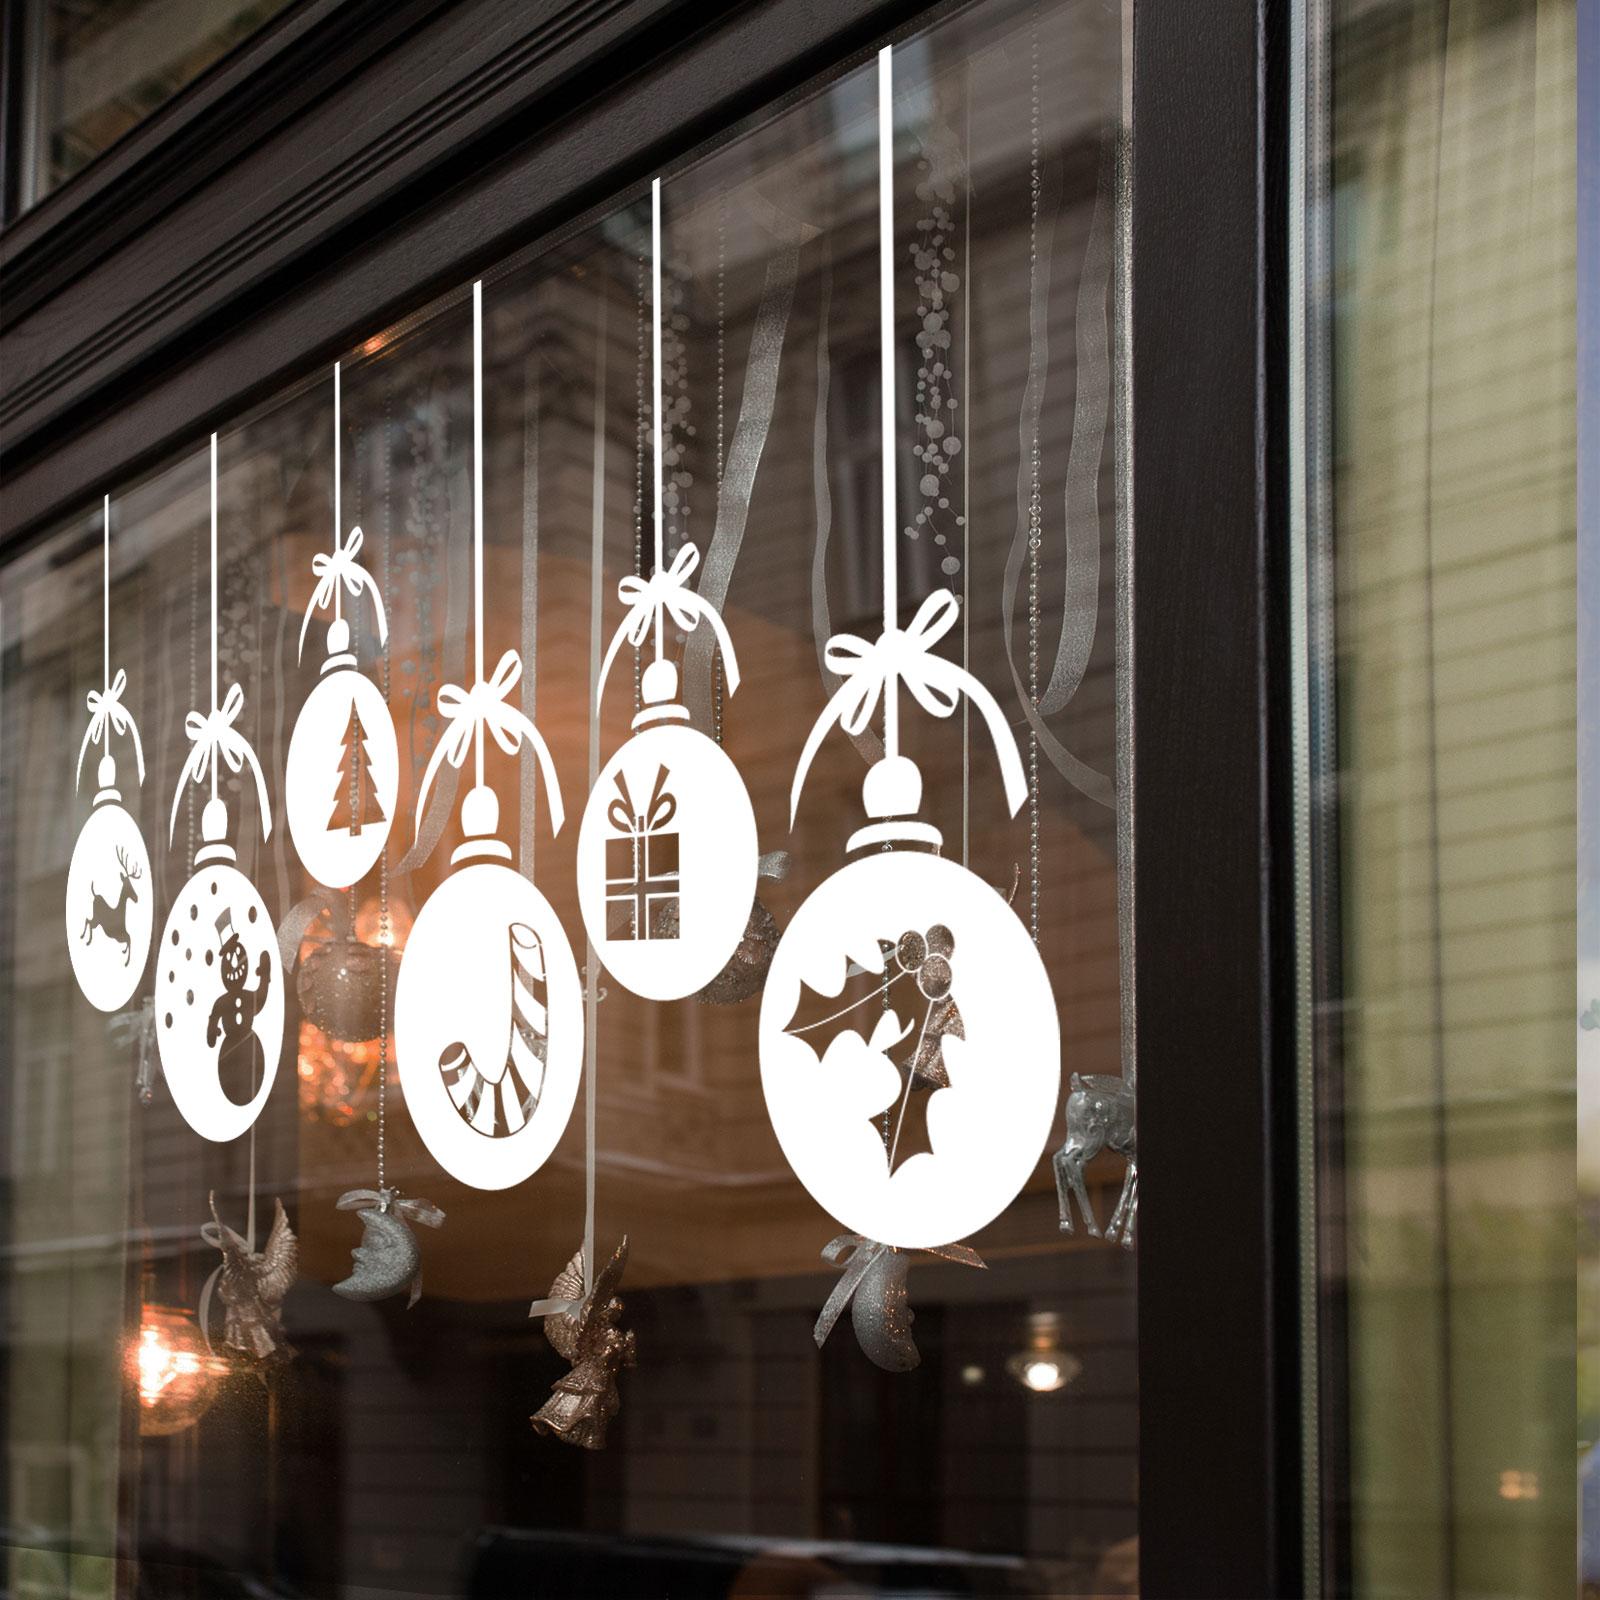 Christmas Xmas Baubles Shop Window Wall Decorations Vinyl